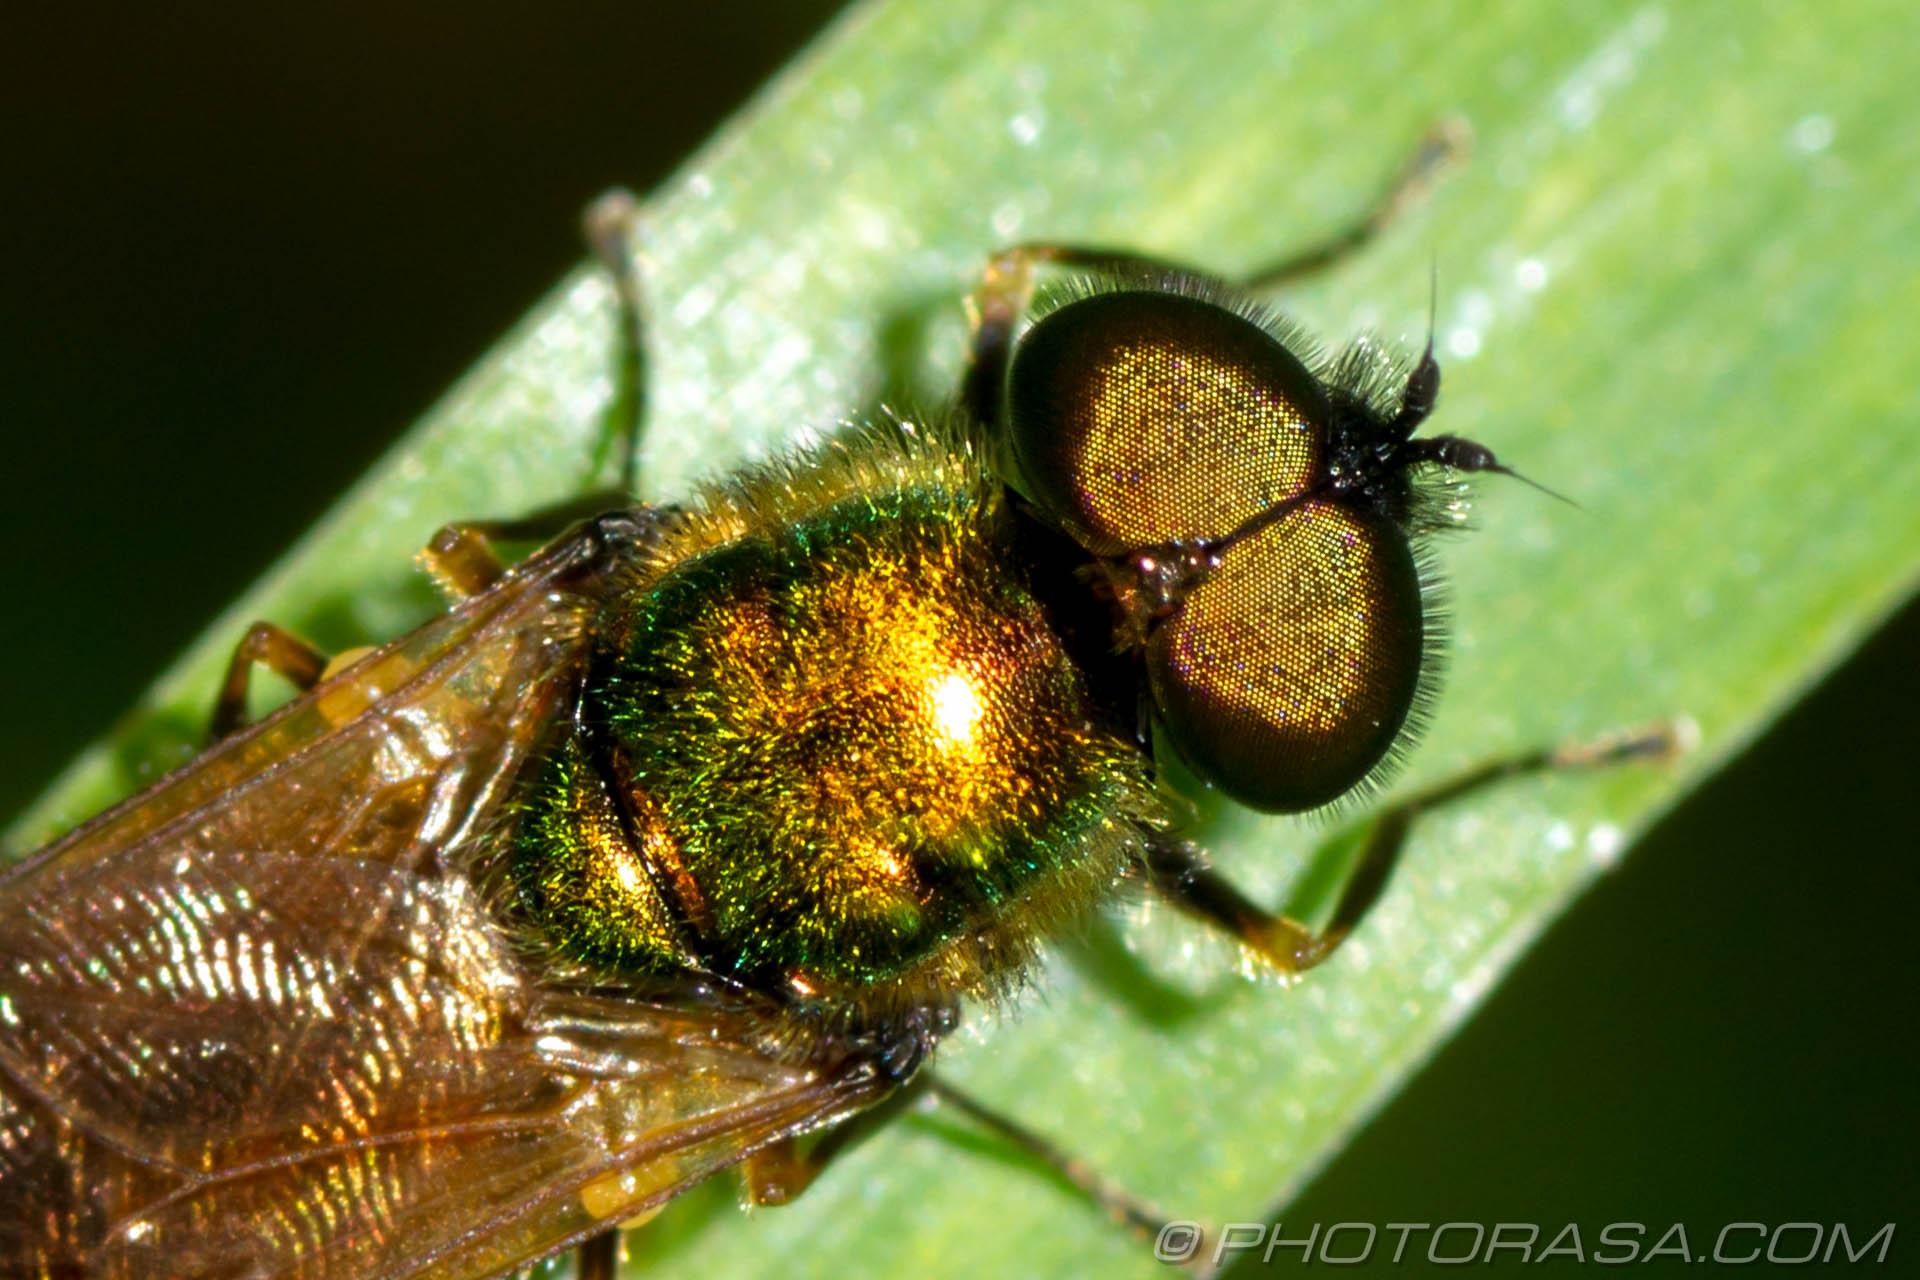 https://photorasa.com/golden-fly/gold-fly-eyes/